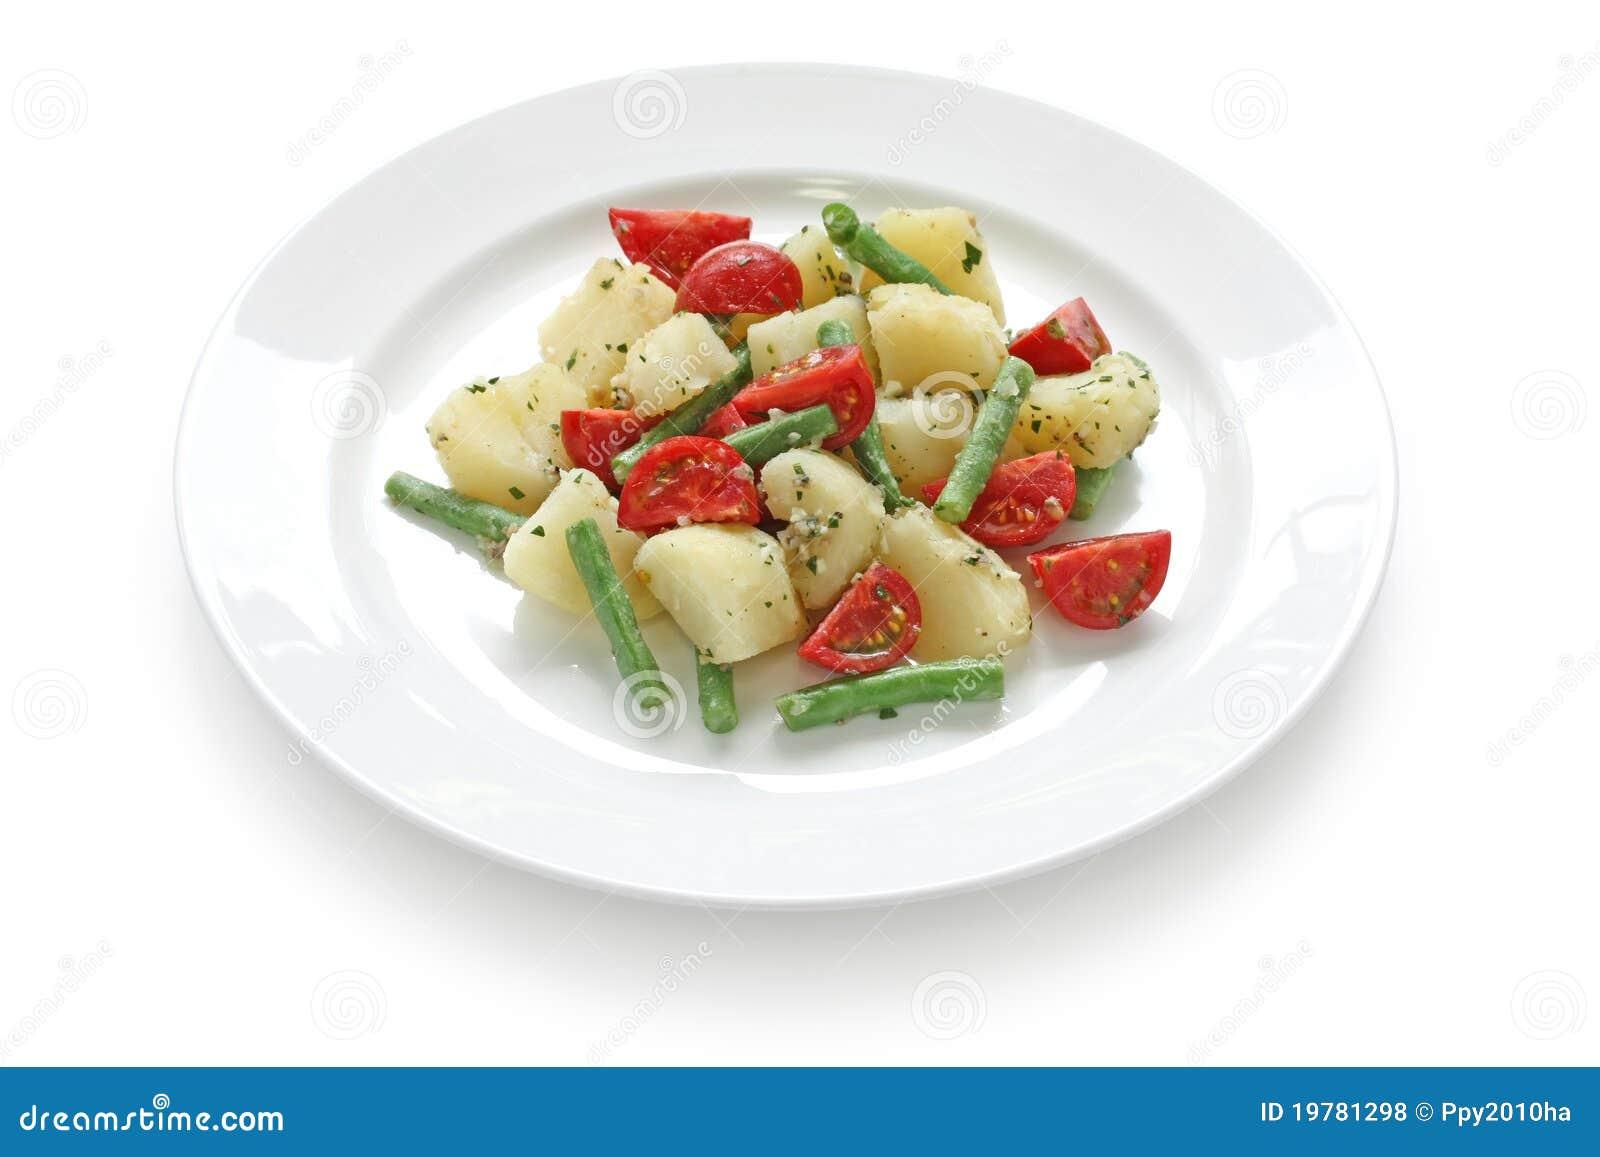 Tomato And Green Bean Salad Royalty-Free Stock Photo ...